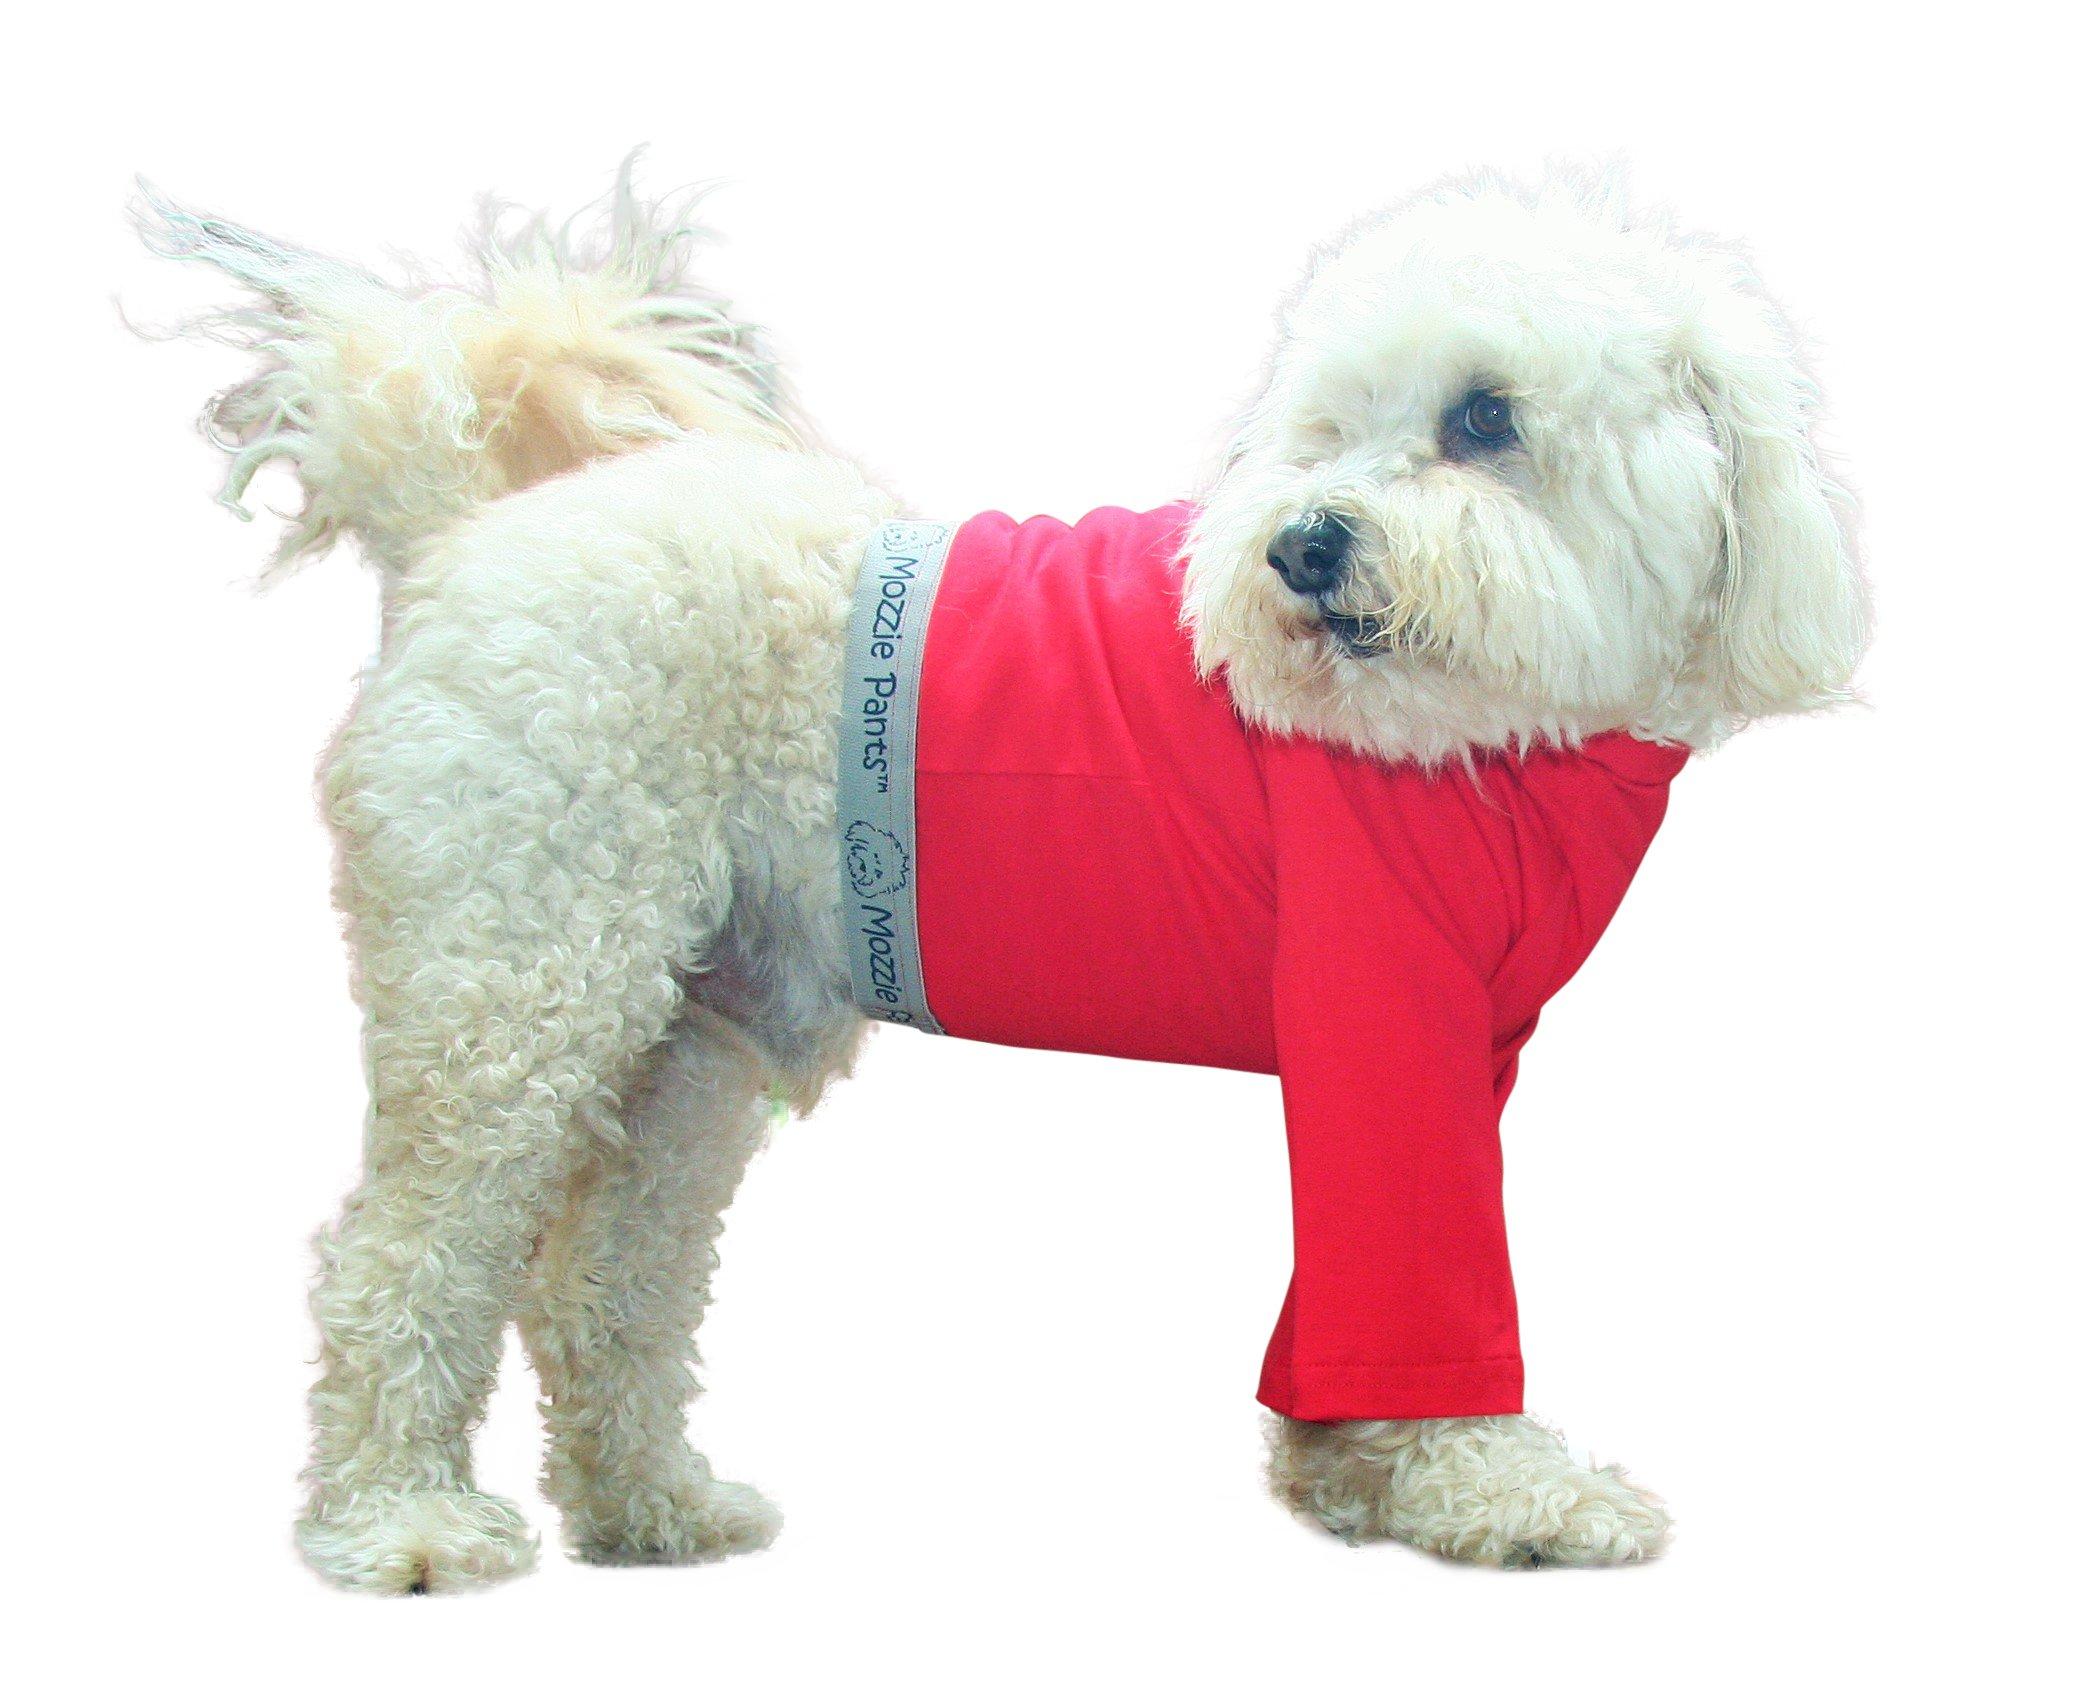 Mozzie Pants Dog T-Shirt, Dog Pants, E-Collar Alternative, Dog Pajamas, Small Dog, Red